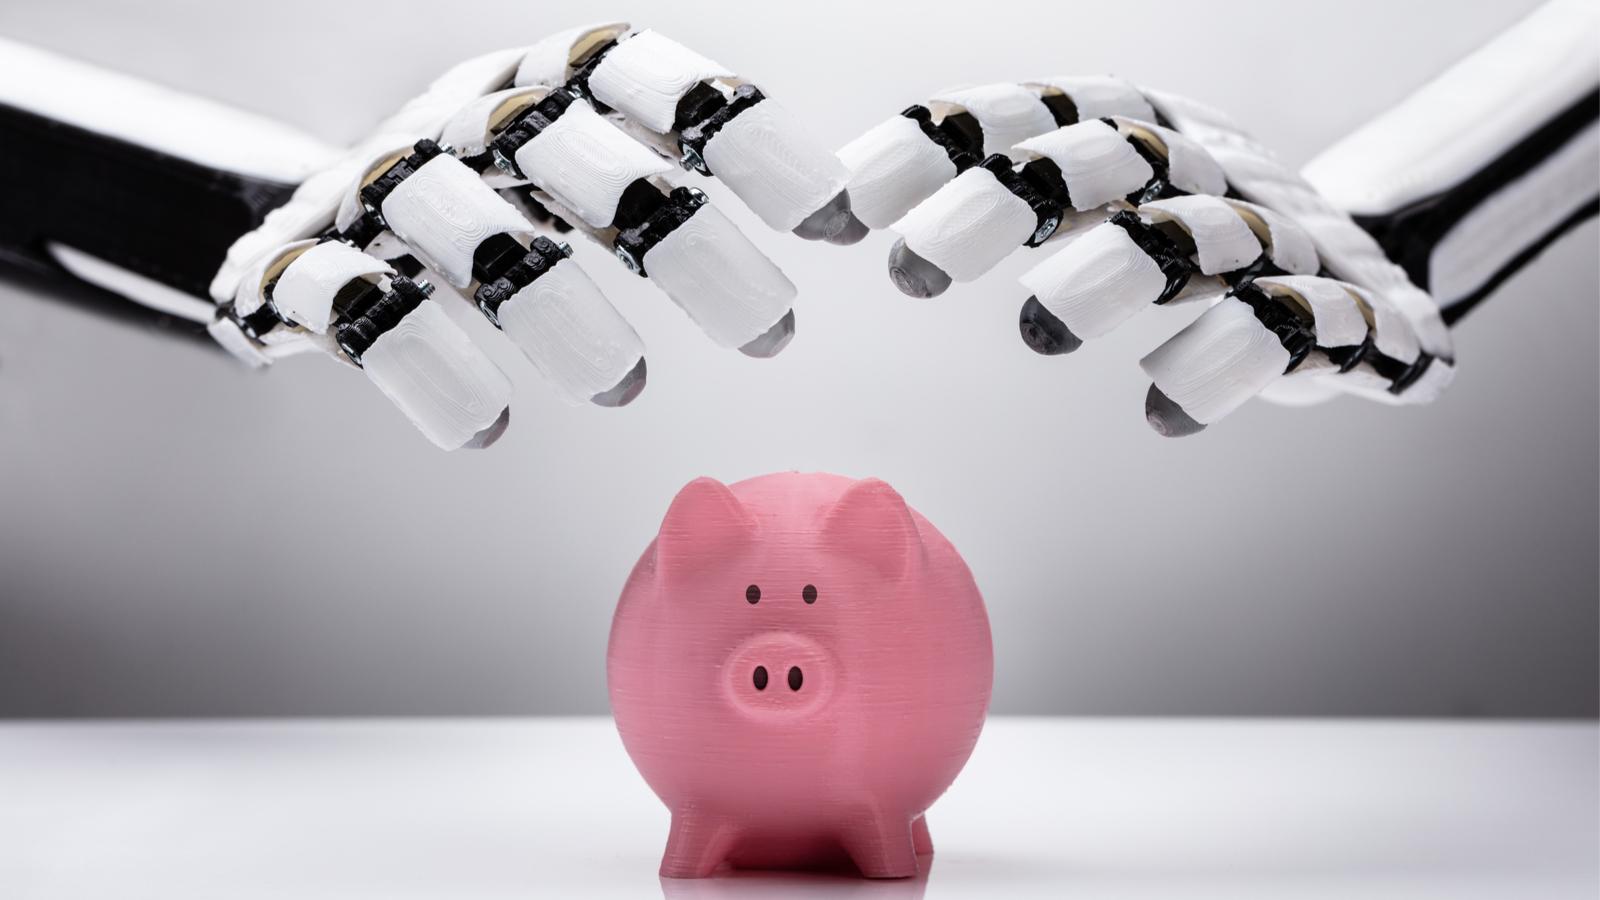 robot hands hovering over a piggy bank